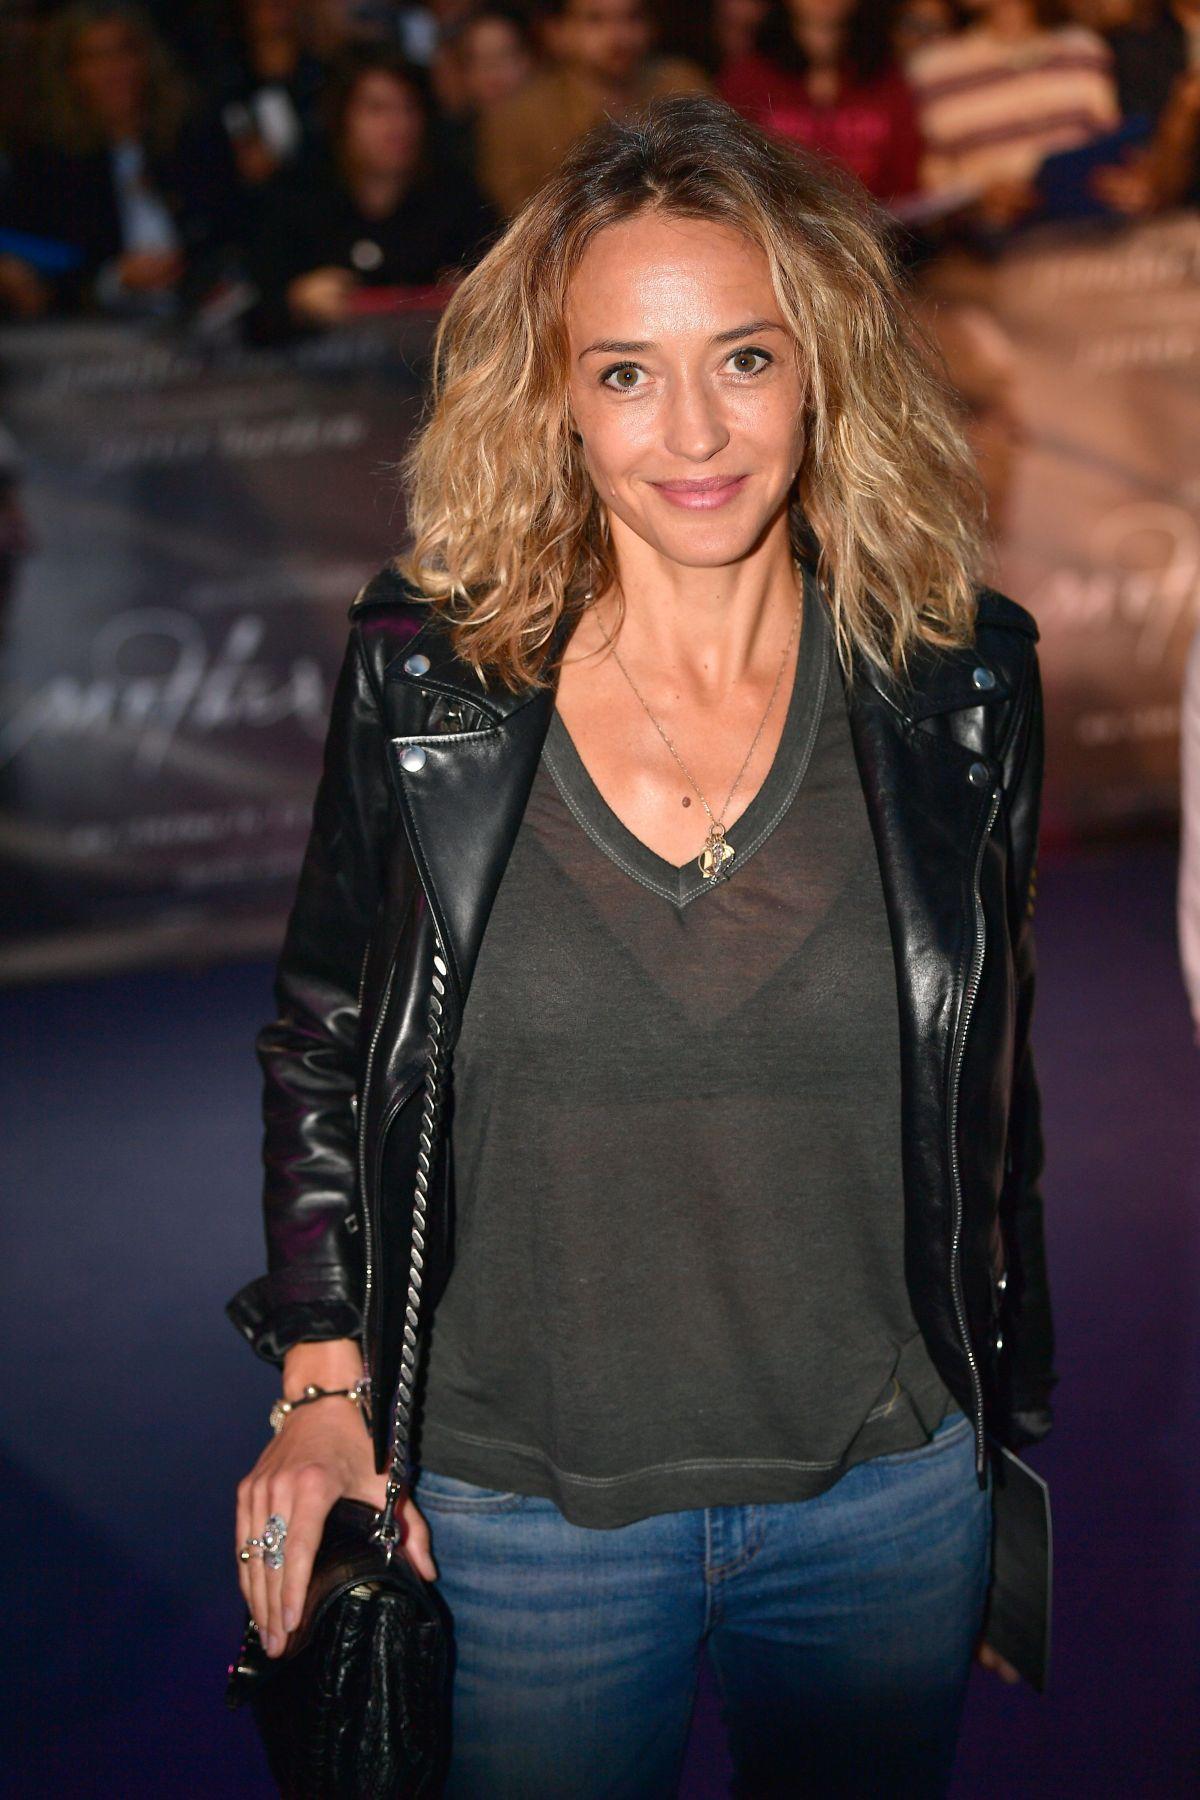 HELENE DE FOUGEROLLES at Mother! Premiere in Paris 09/07/2017